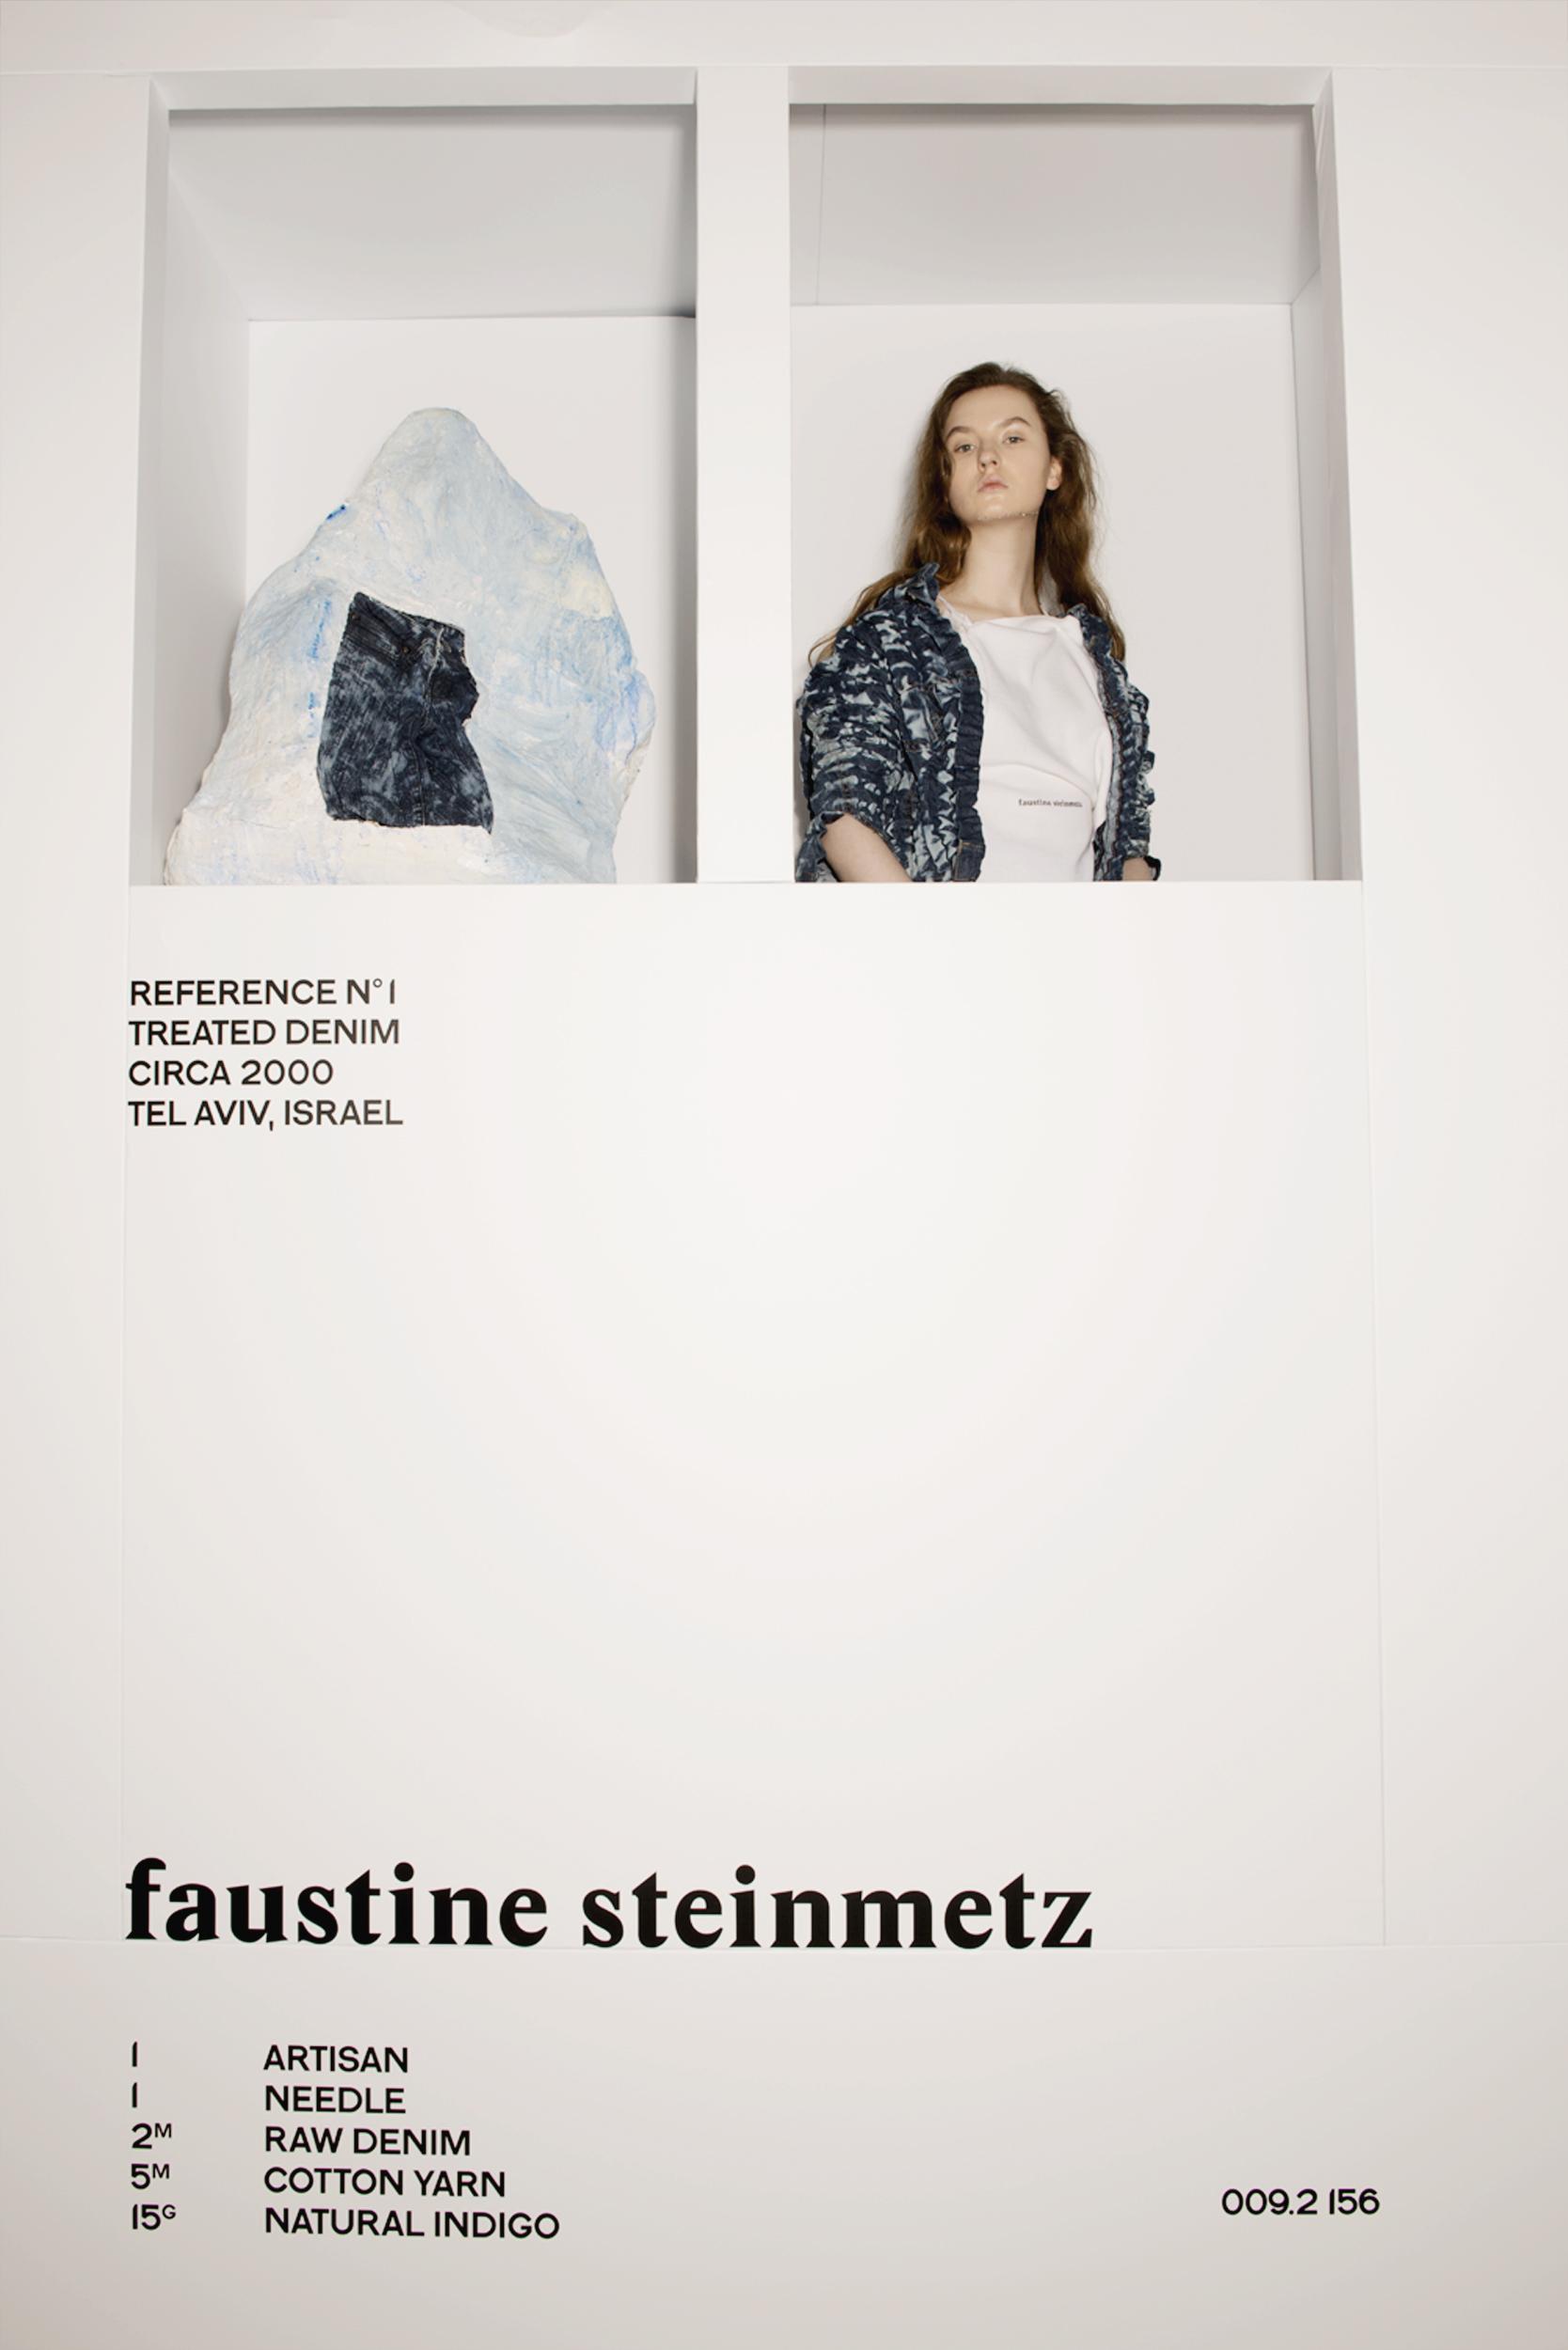 Faustine Steinmetz RTW Fall 2017